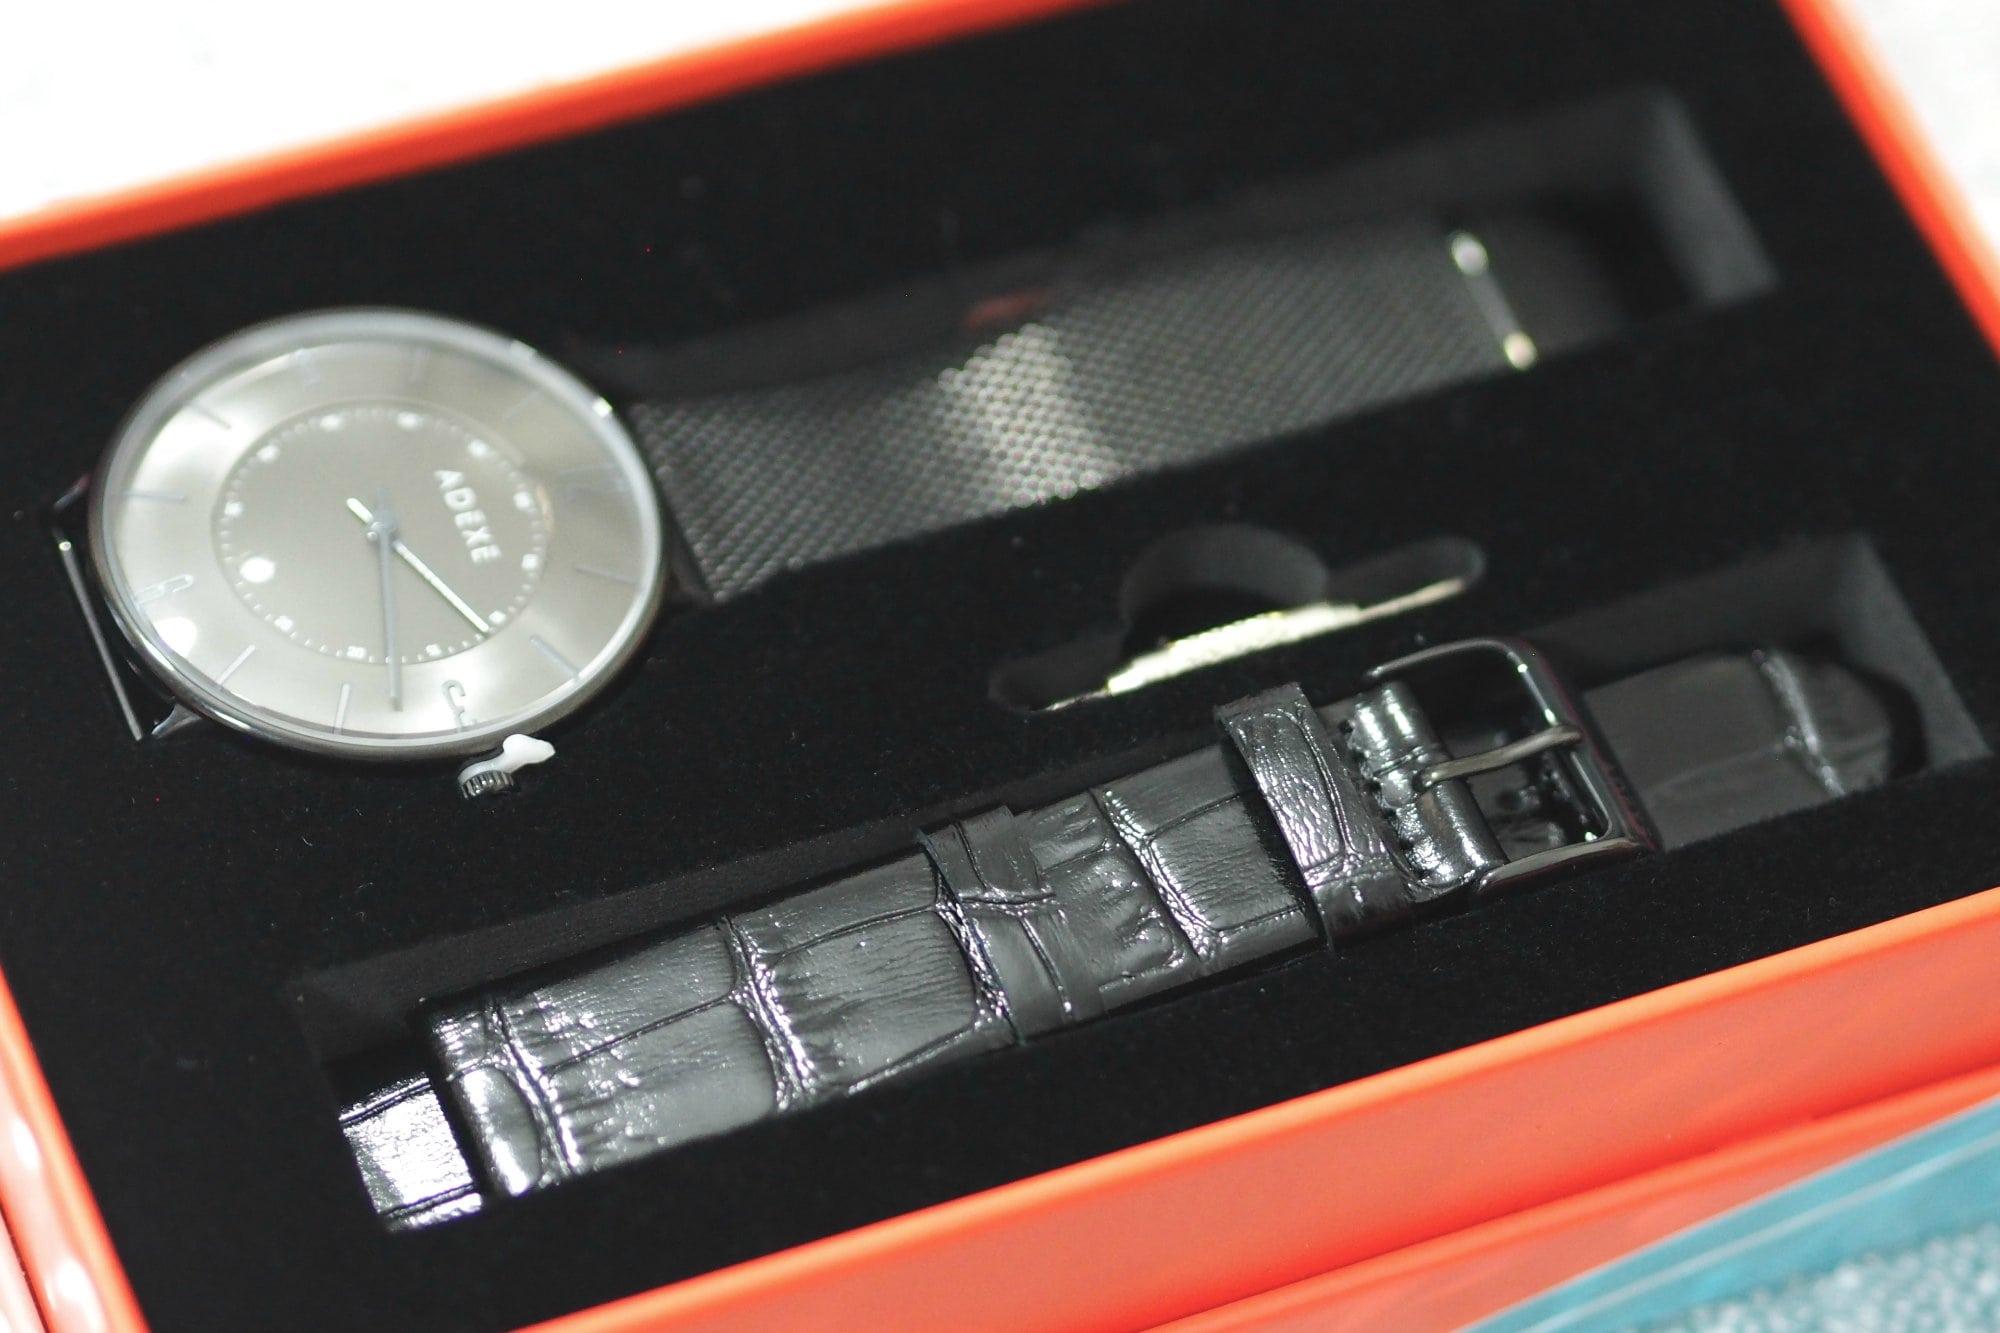 Adexe MAC Grande Gun Black Watch PLUS Giveaway!